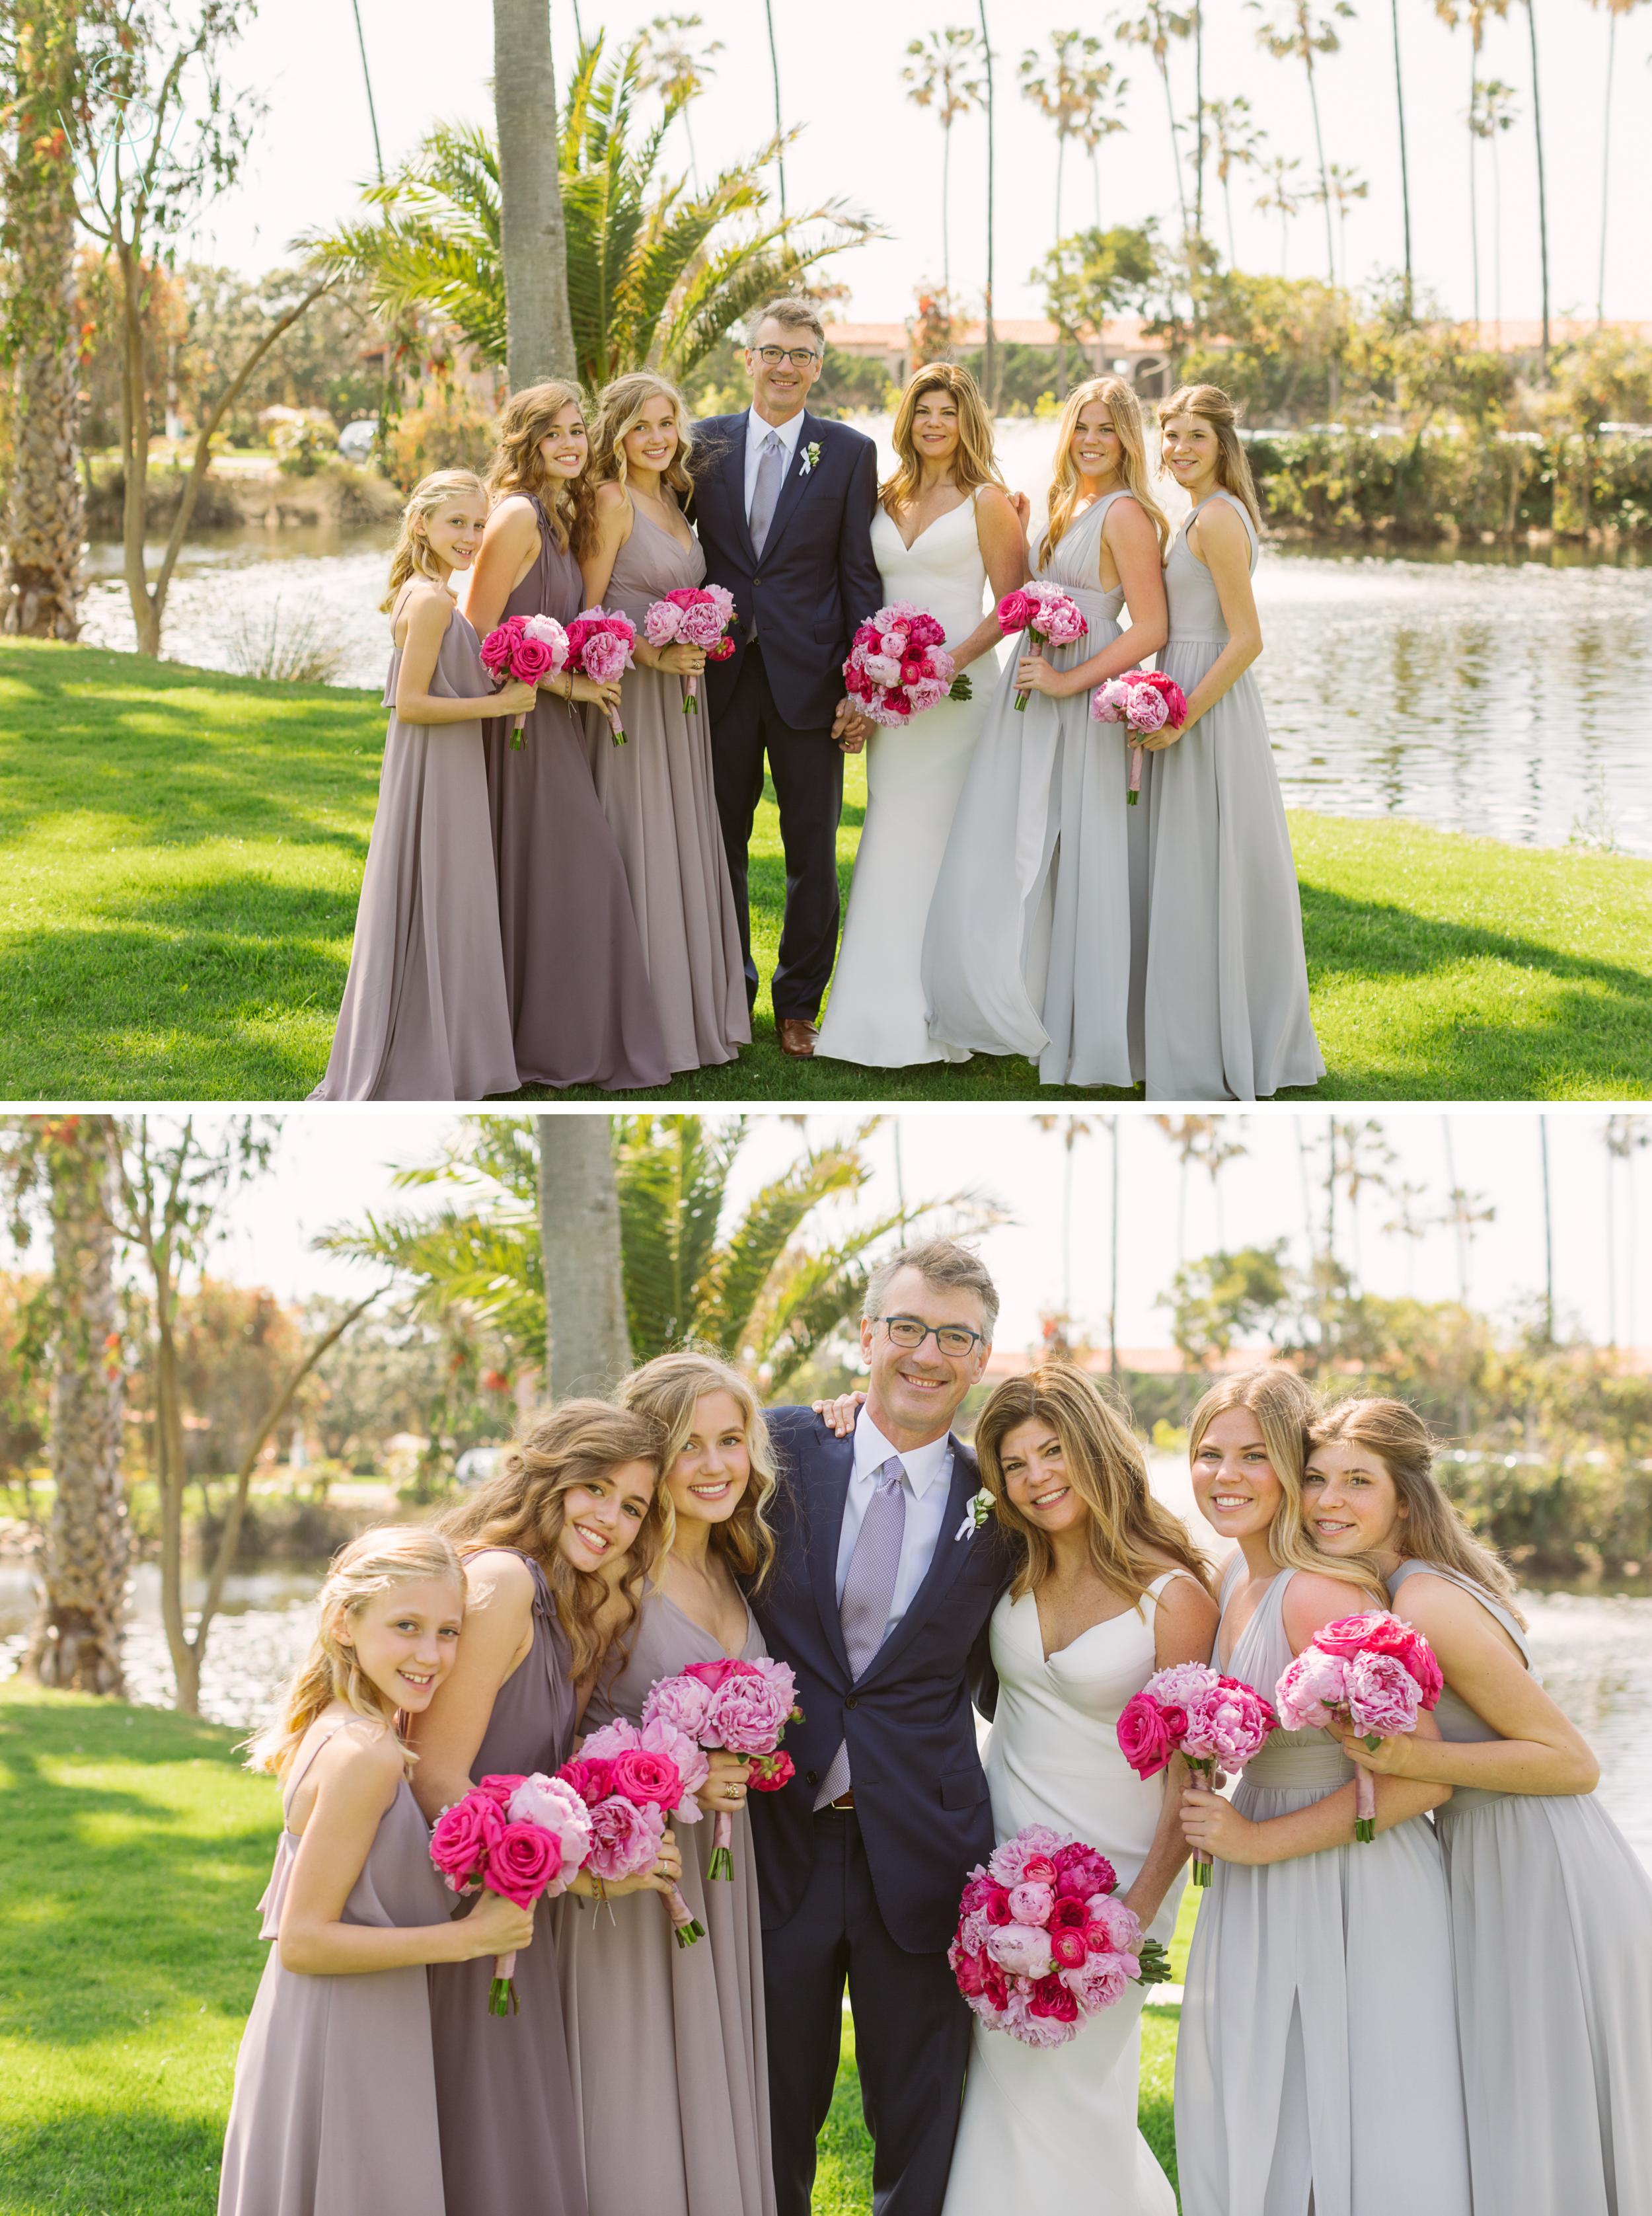 shewanders.wedding.photography.la.jolla-1017.jpg